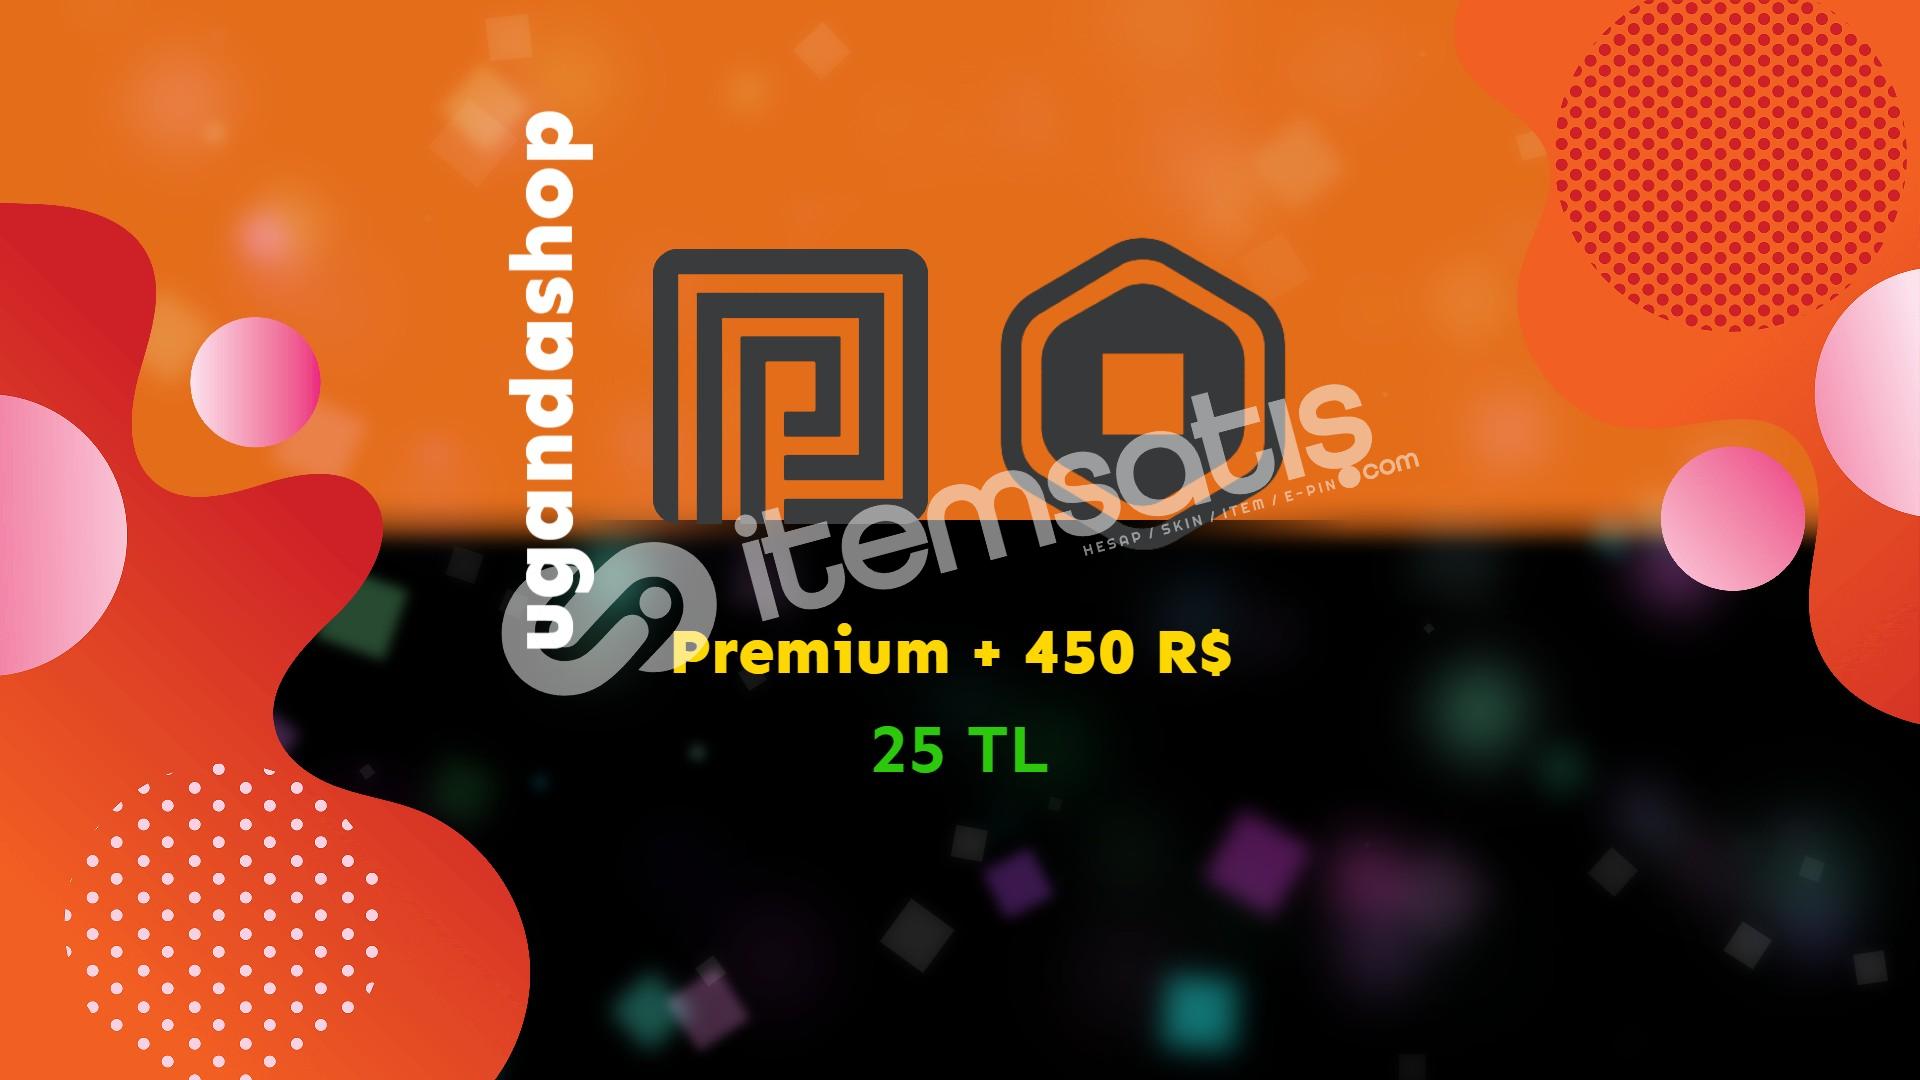 Roblox Premium + 450 Robux